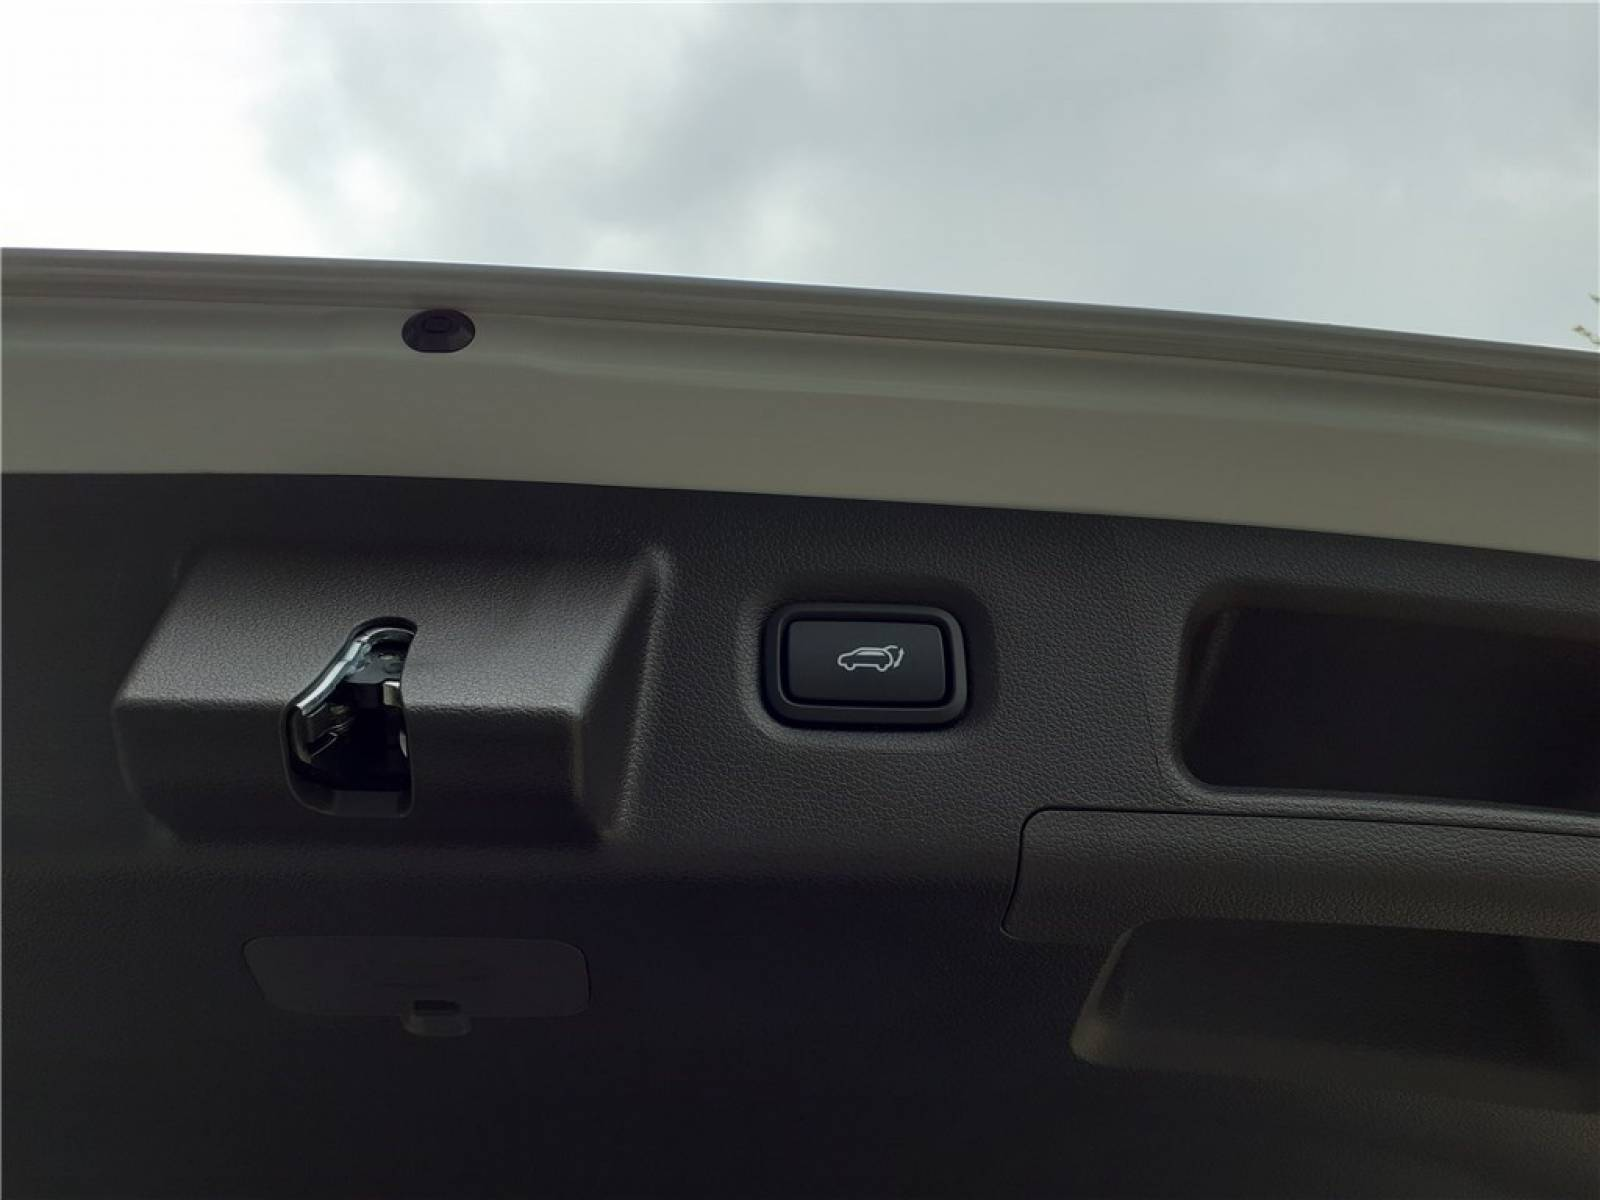 HYUNDAI Santa Fé 1.6 T-GDi Plug-in 265 HTRAC BVA6 - véhicule d'occasion - Groupe Guillet - Chalon Automobiles - 71100 - Chalon-sur-Saône - 58